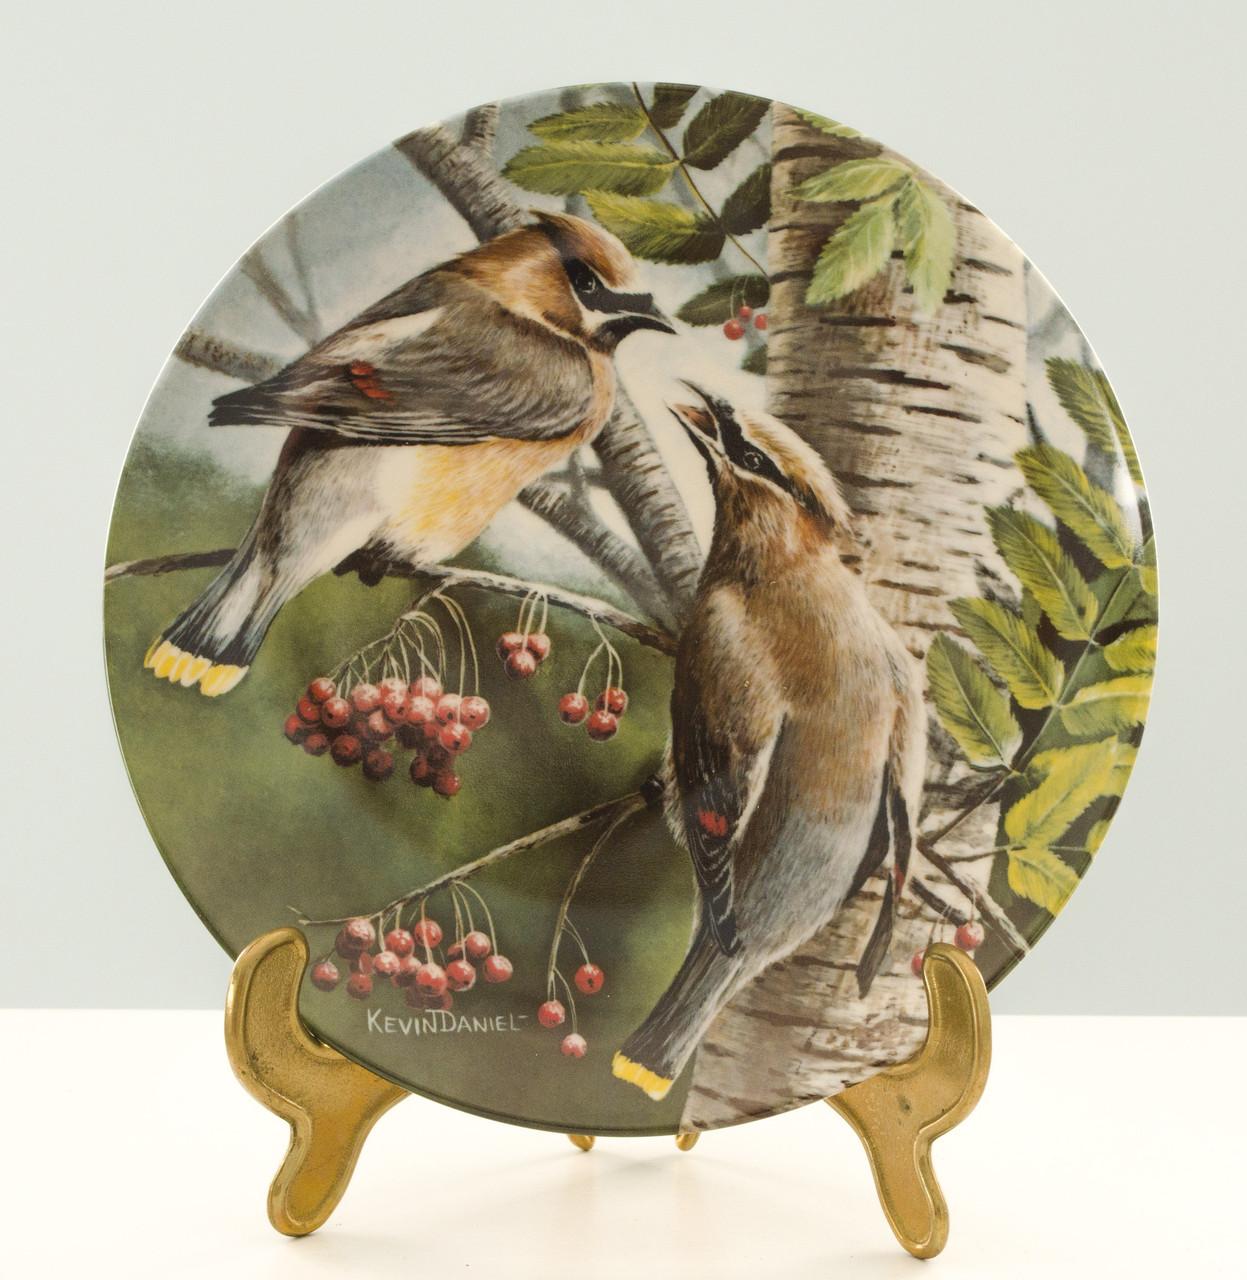 Коллекционная фарфоровая тарелка, фарфор, The Cedar Waxwing, Knowles, Англия, 1987 год